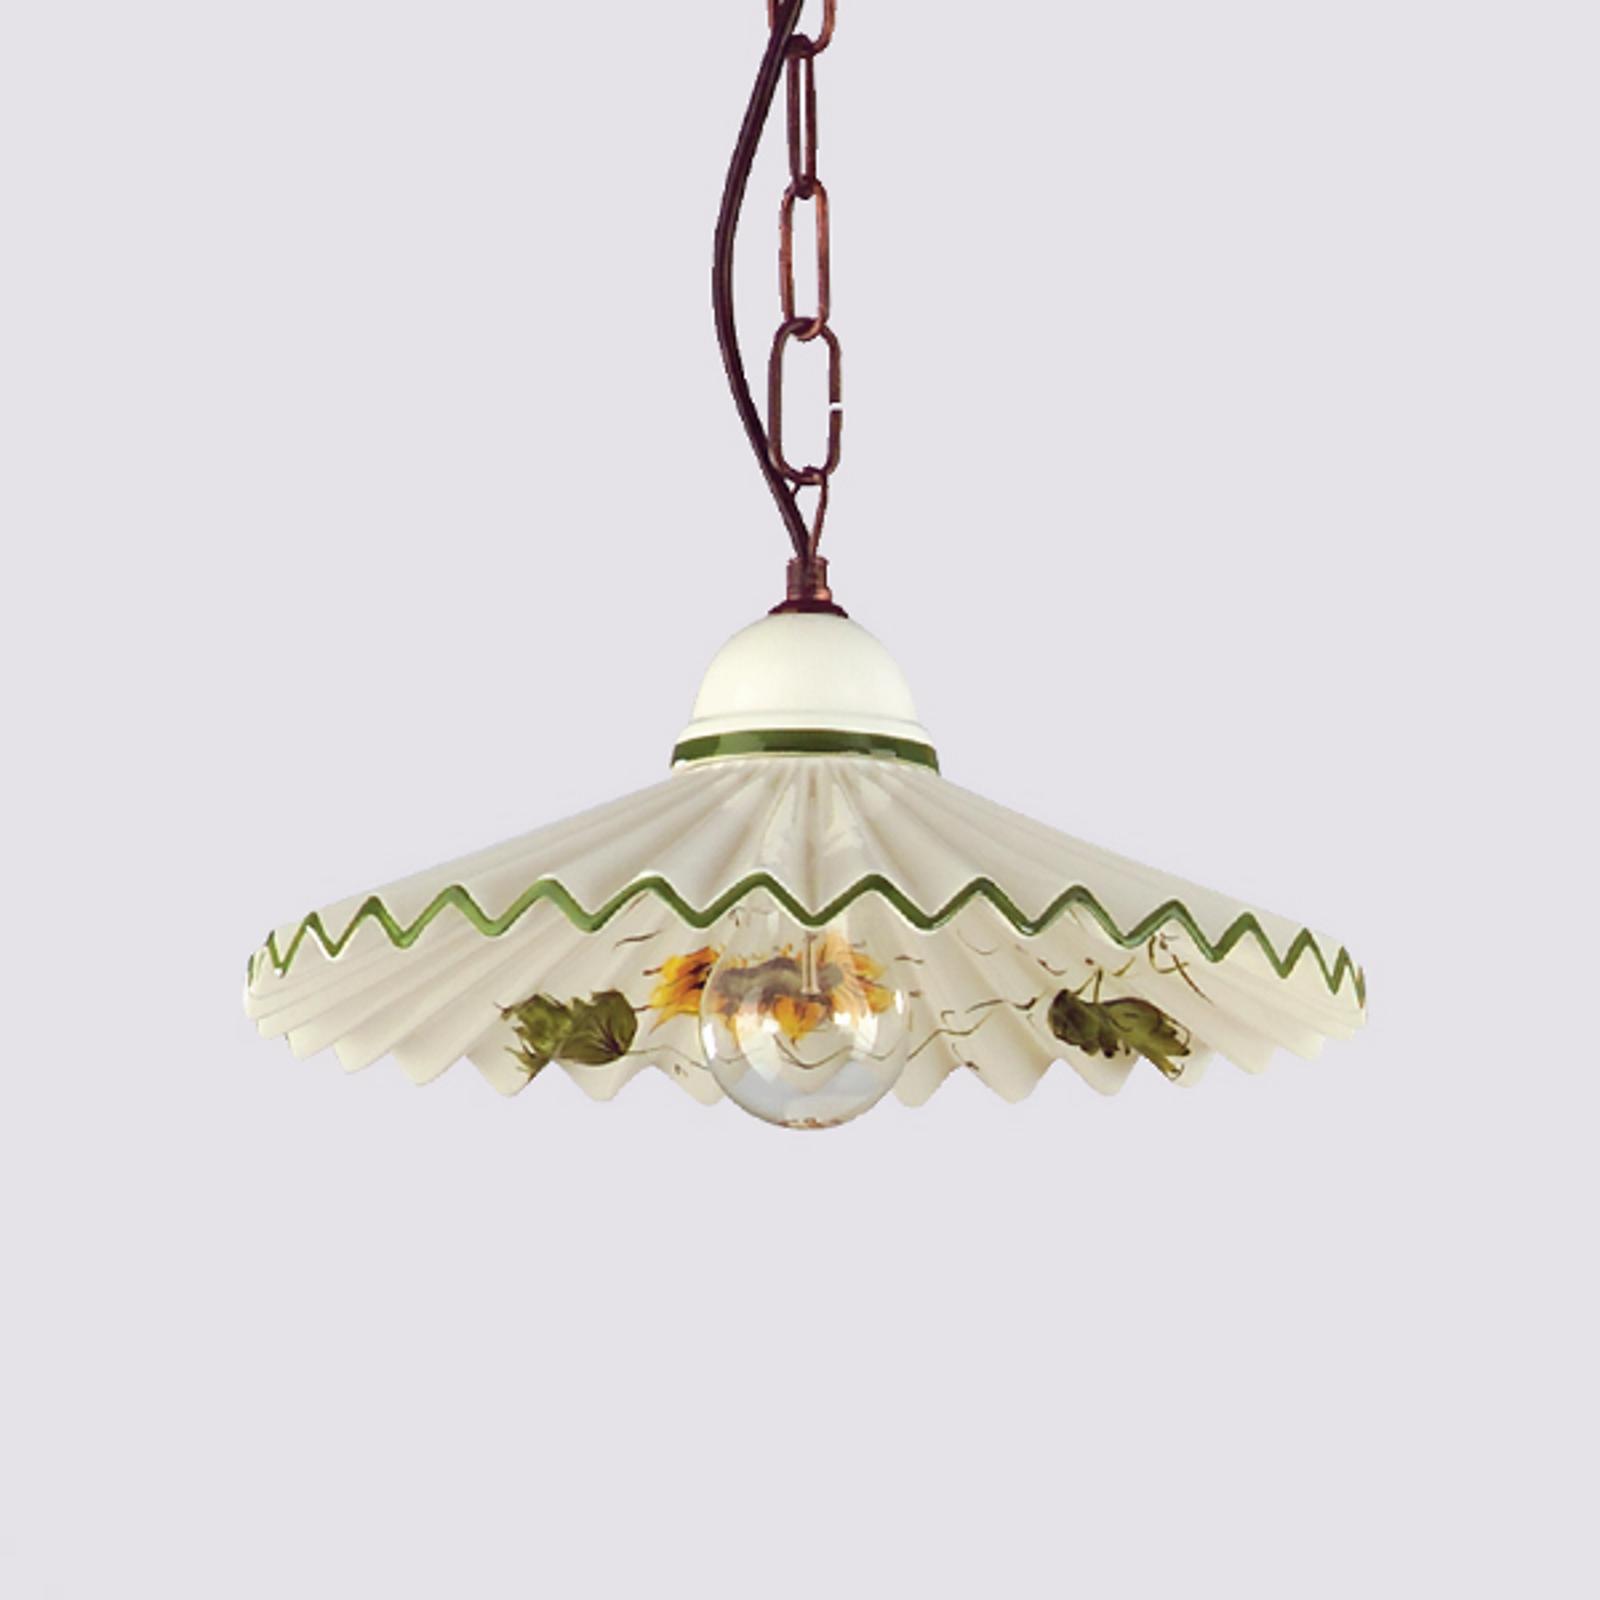 Hængelampe Rusticana m. kædeophæng